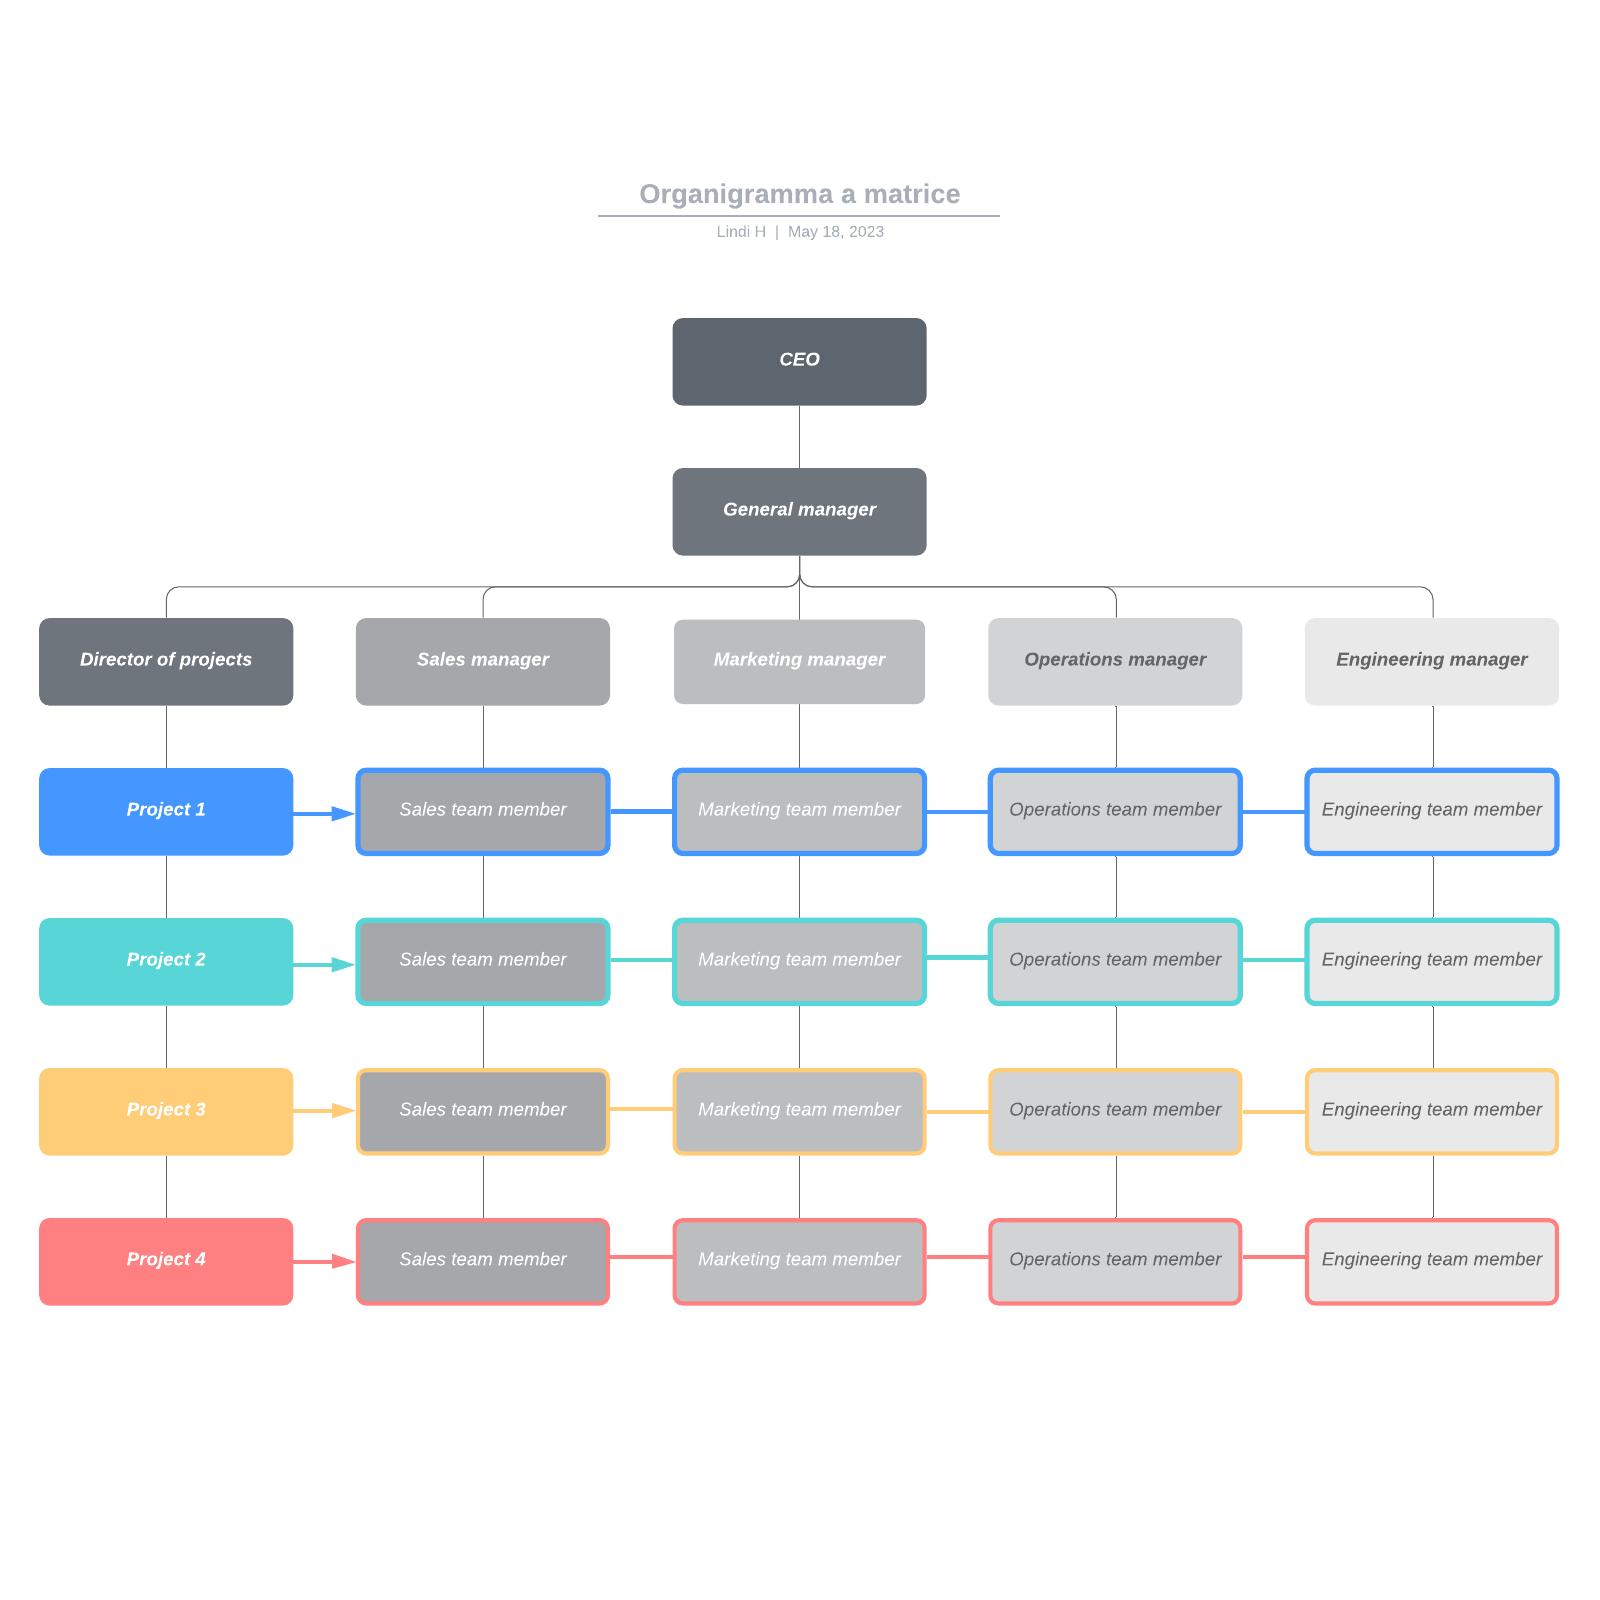 Organigramma a matrice